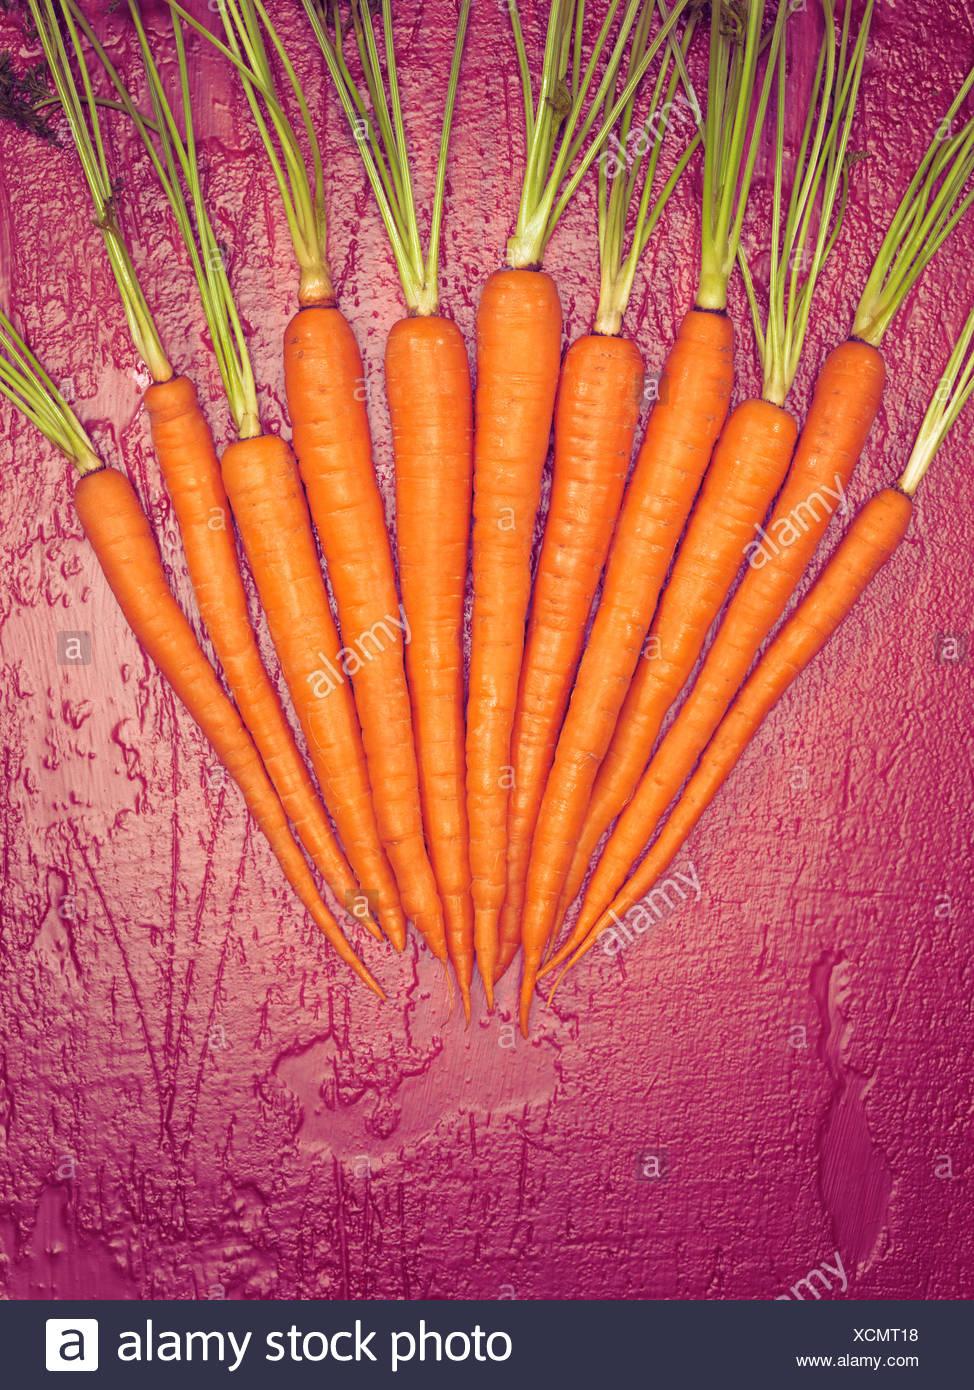 Carrots arranged on magenta underground Stock Photo